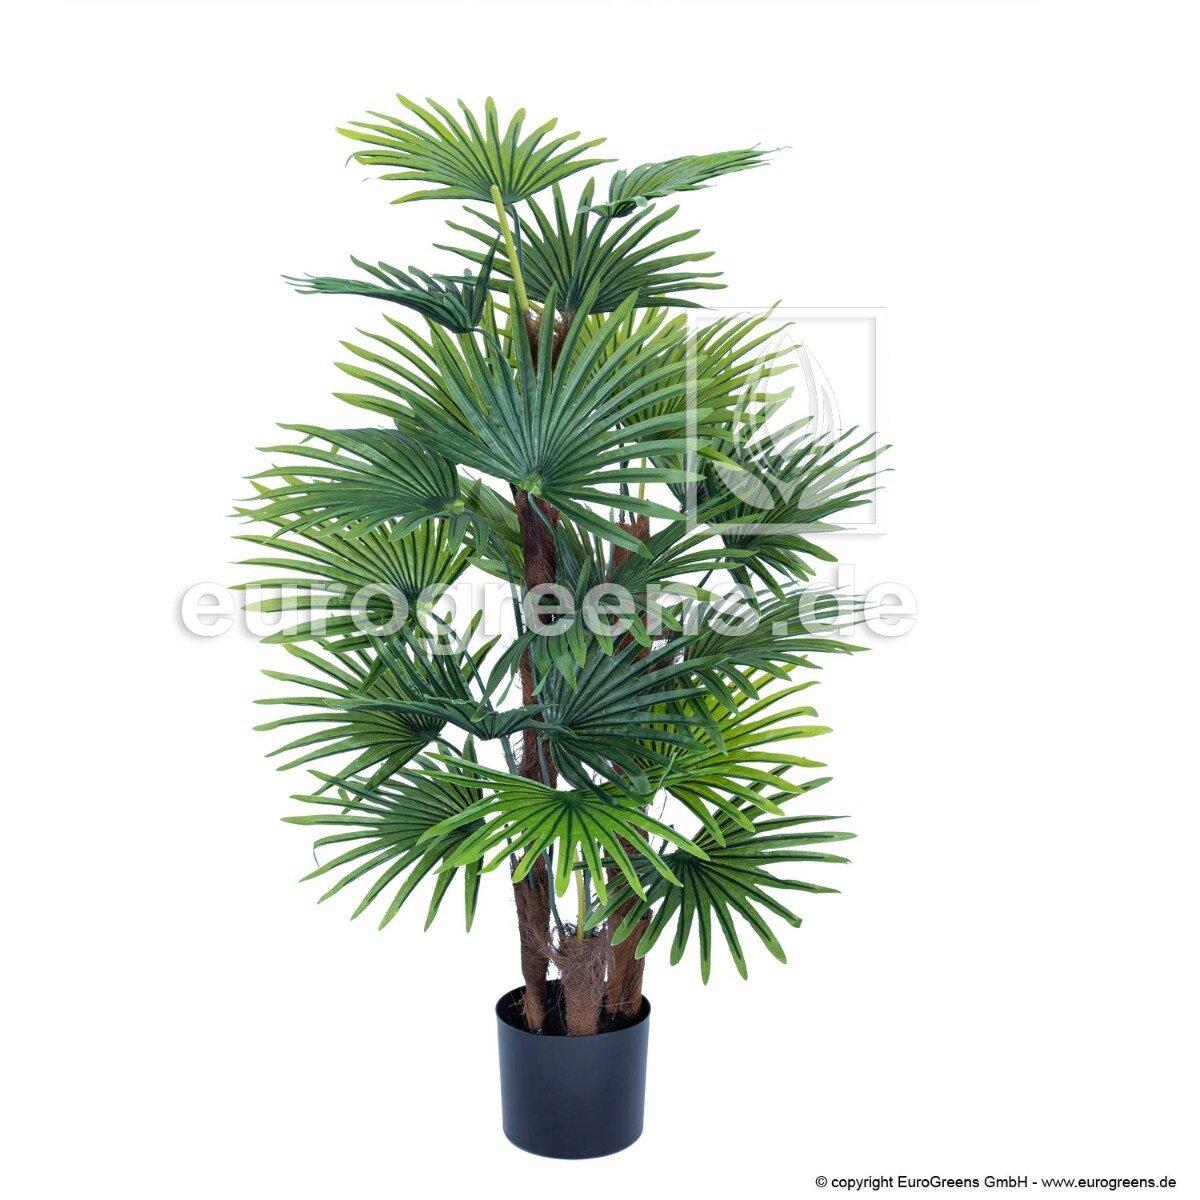 Umelá palma Livistona 110 cm